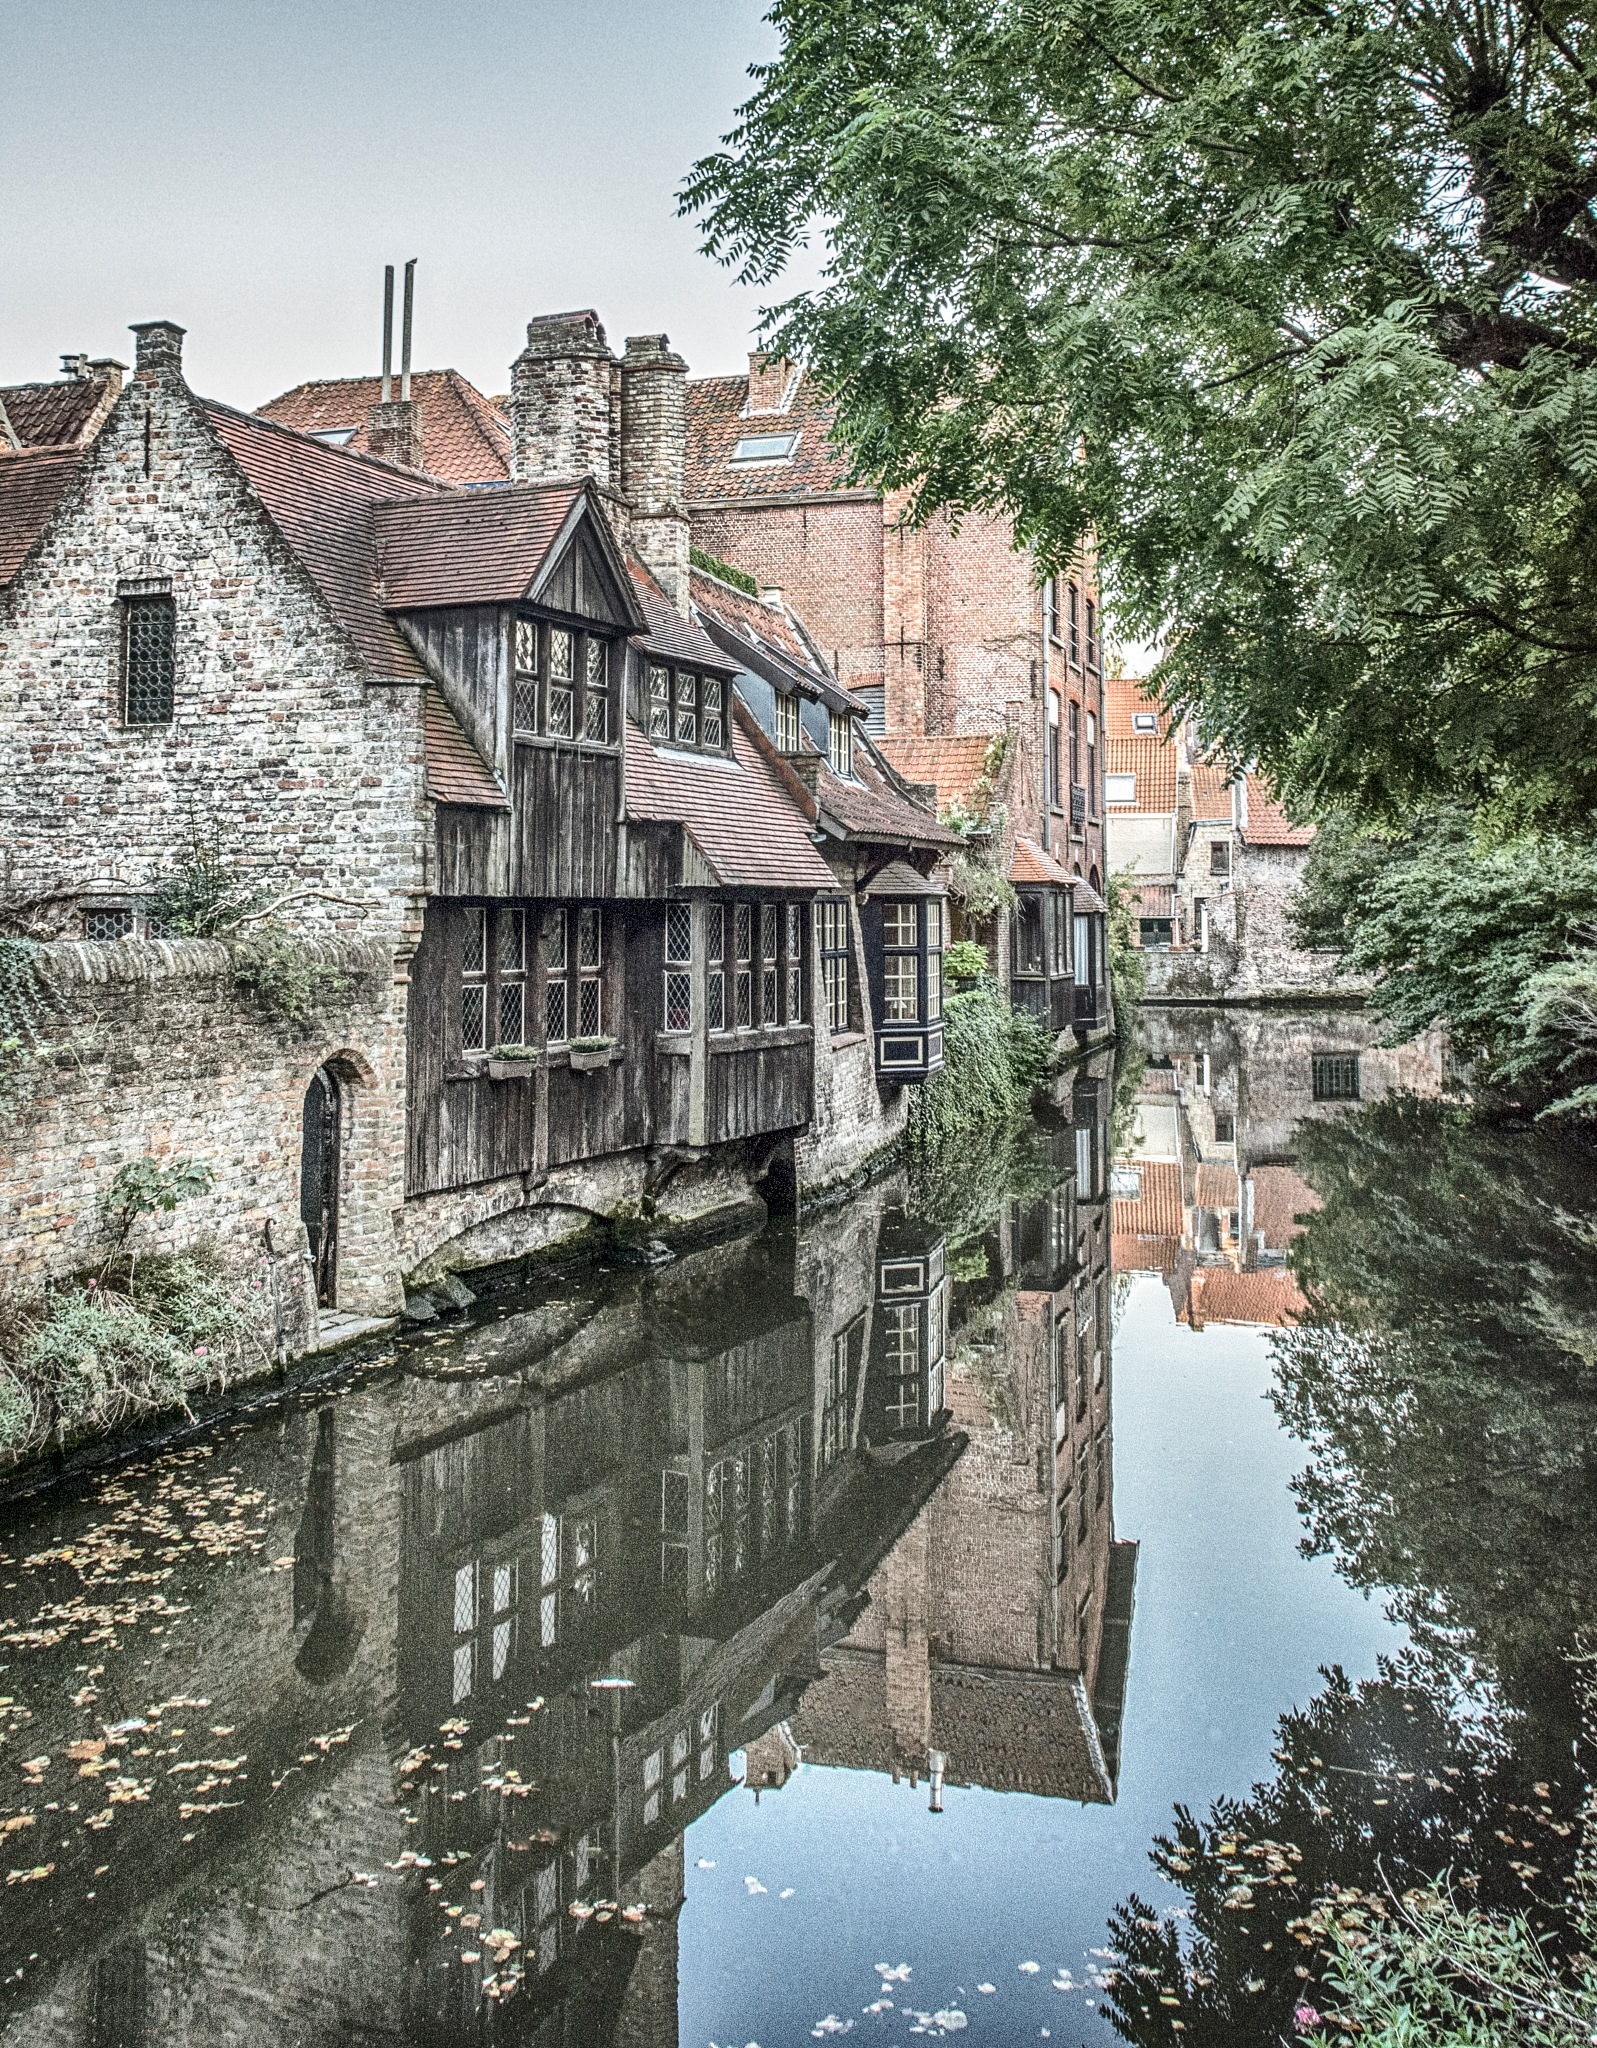 Brugge by Haveetje